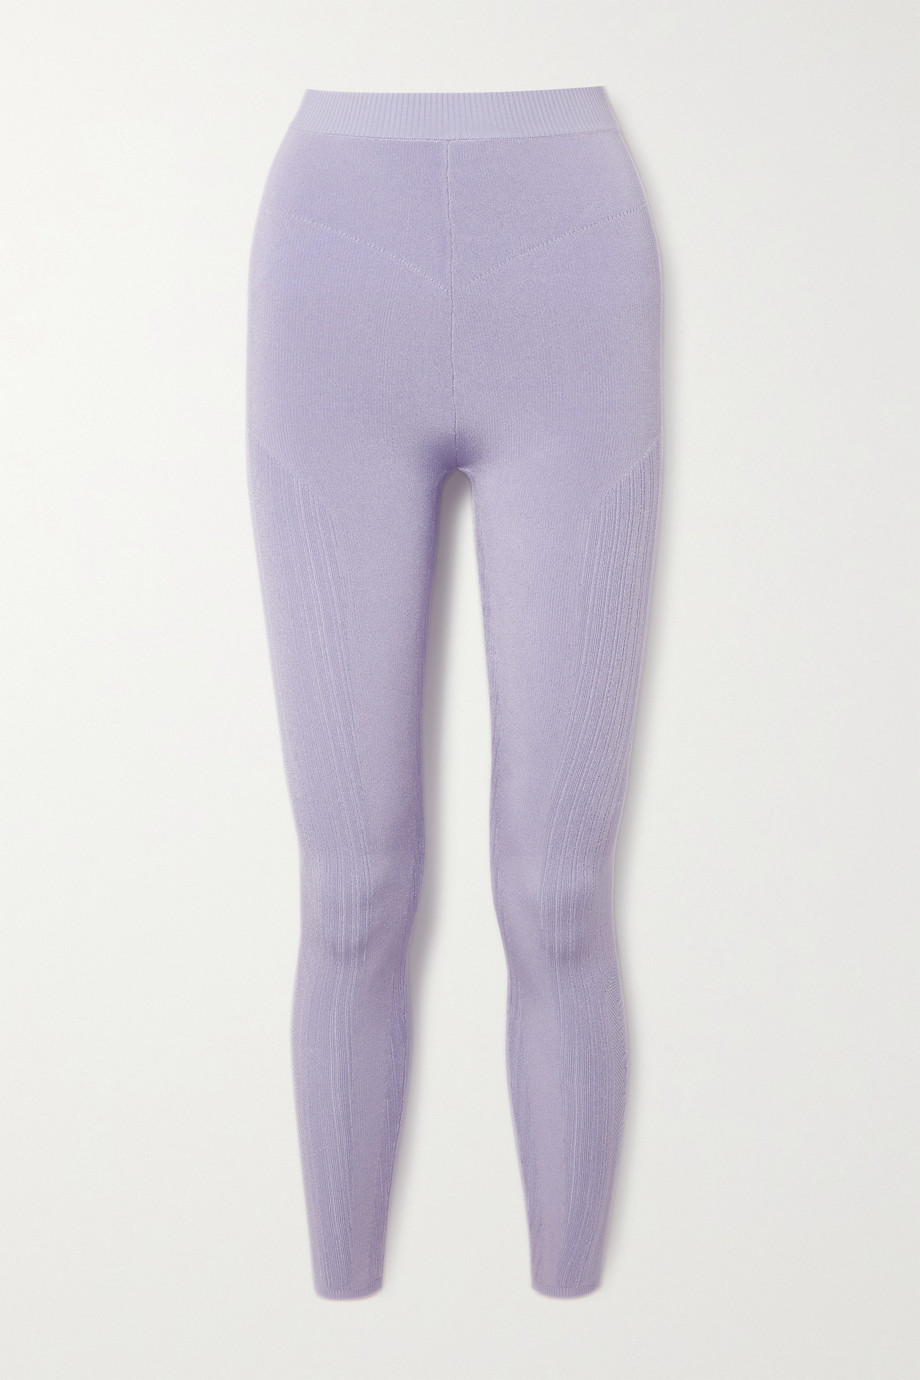 AZ Factory Legging en mailles stretch MyBody